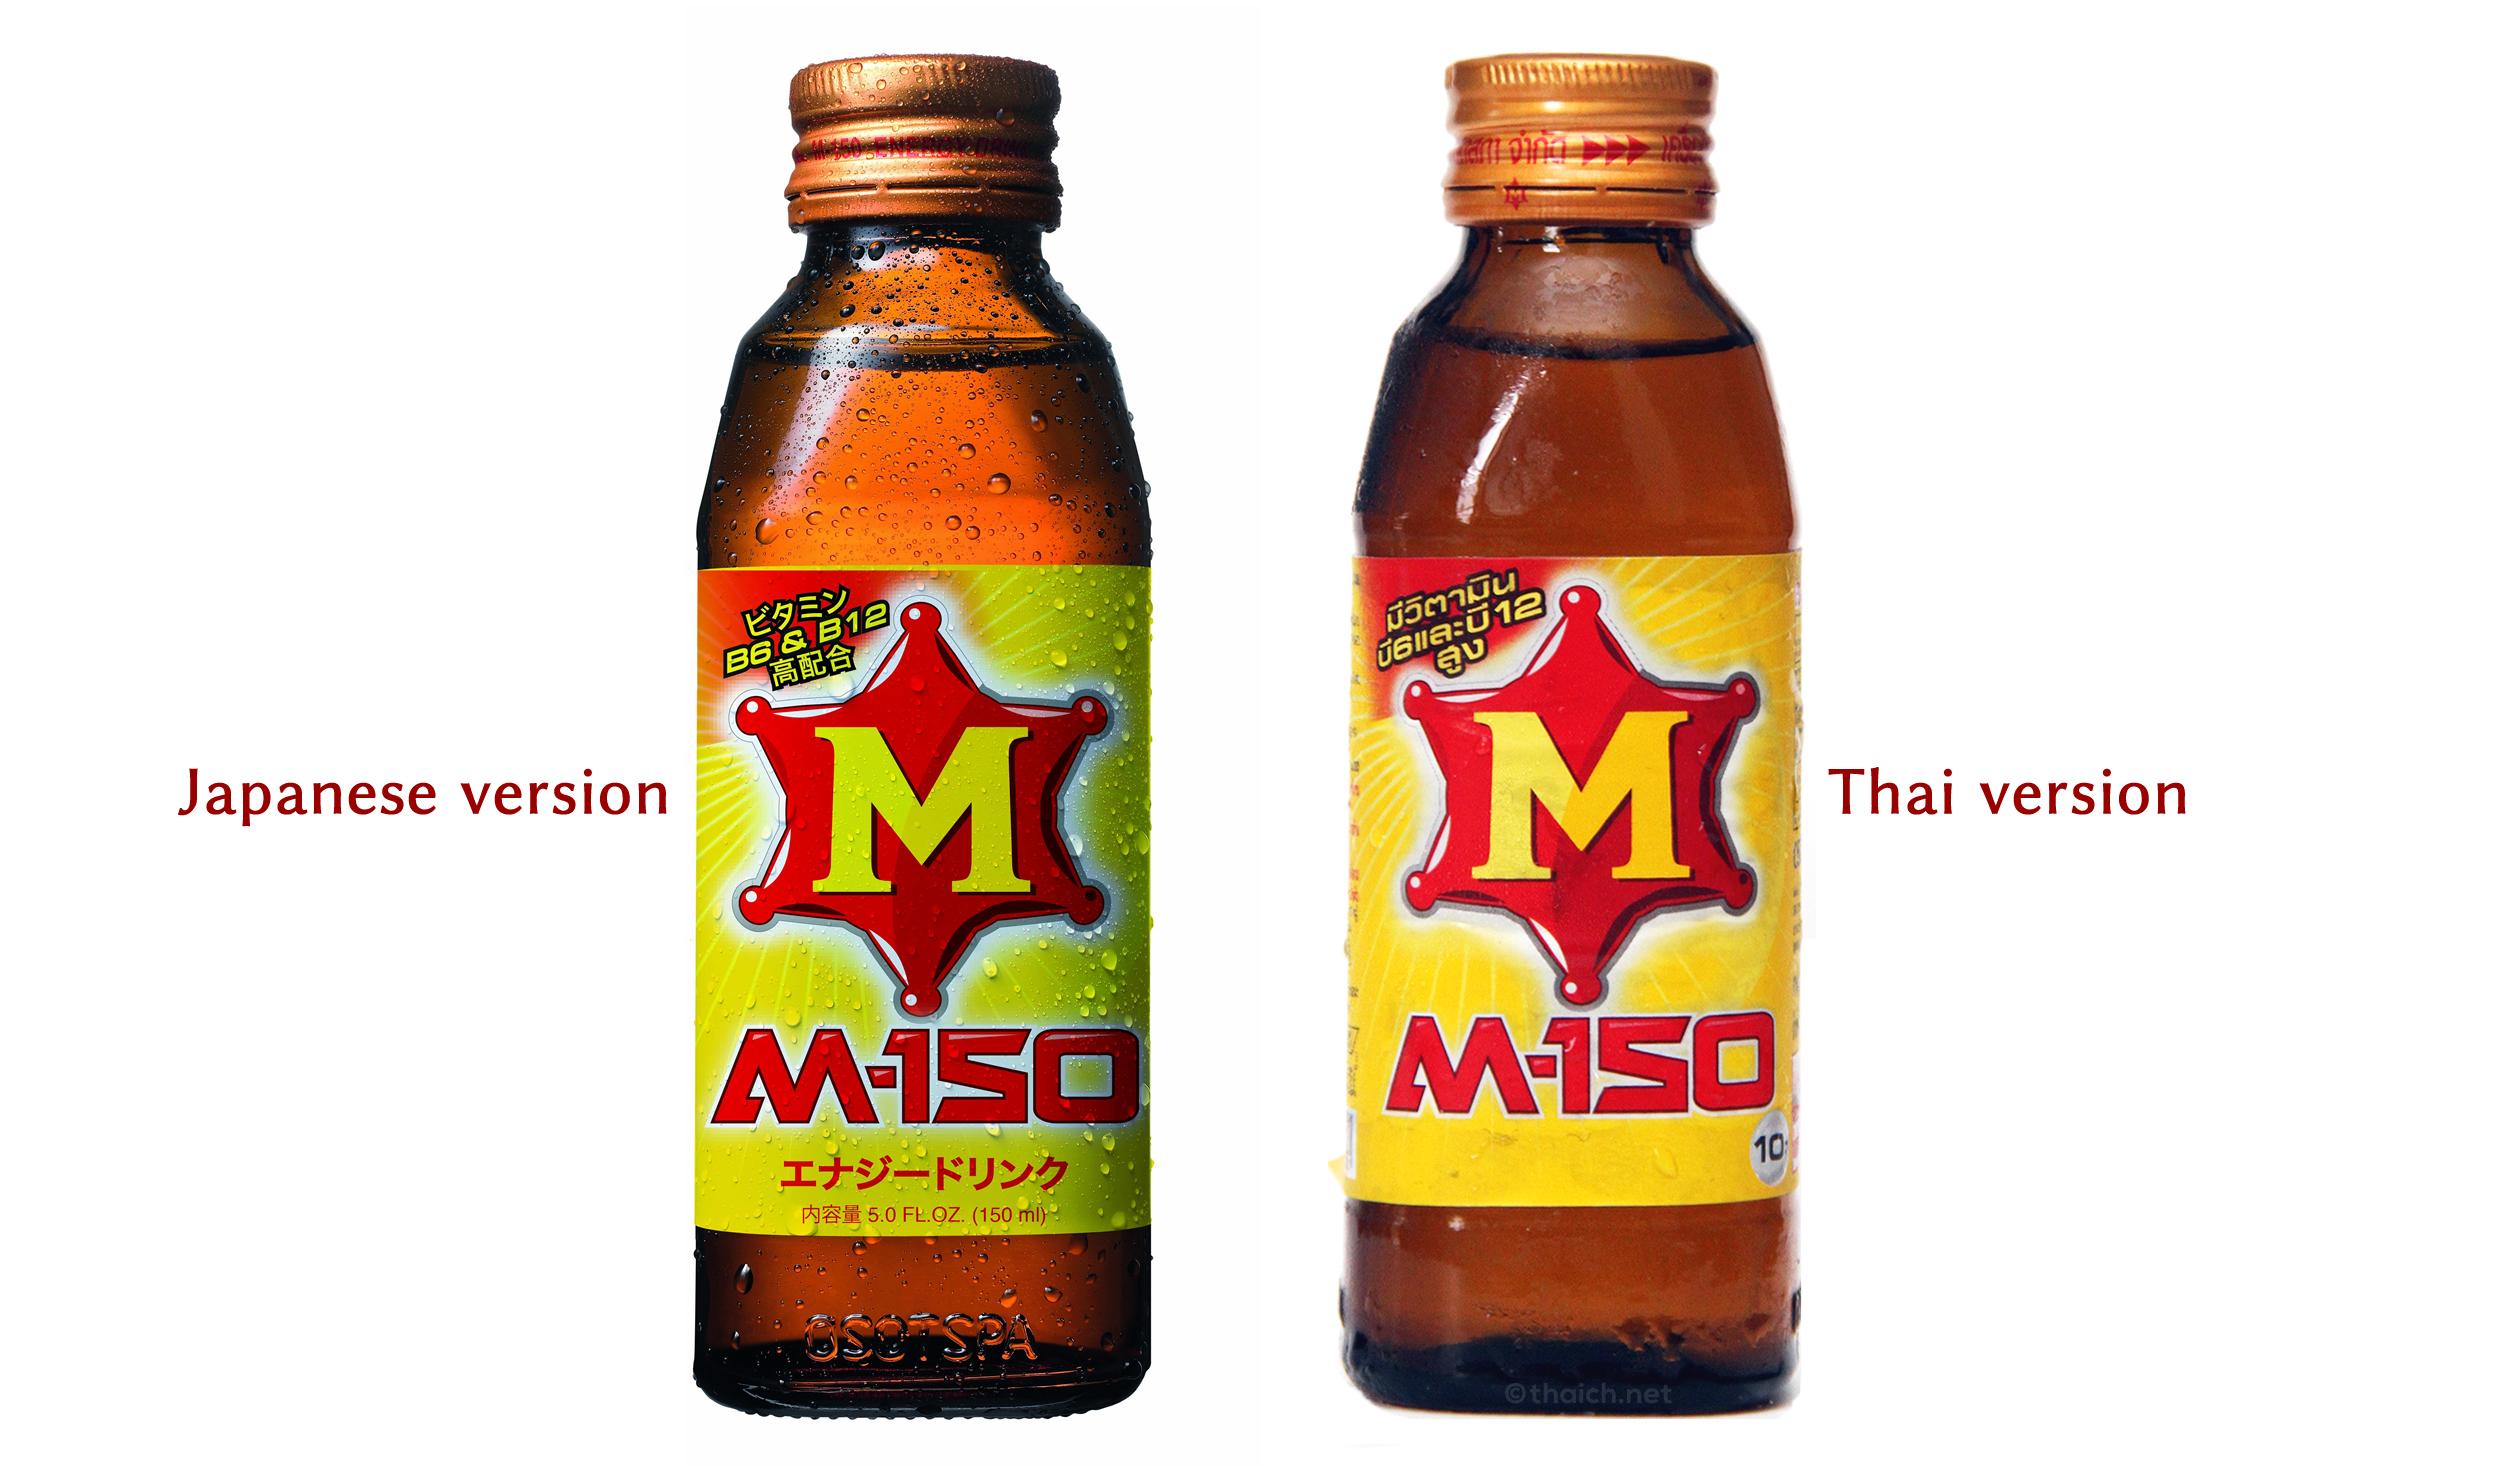 M-150 日本版とタイ版